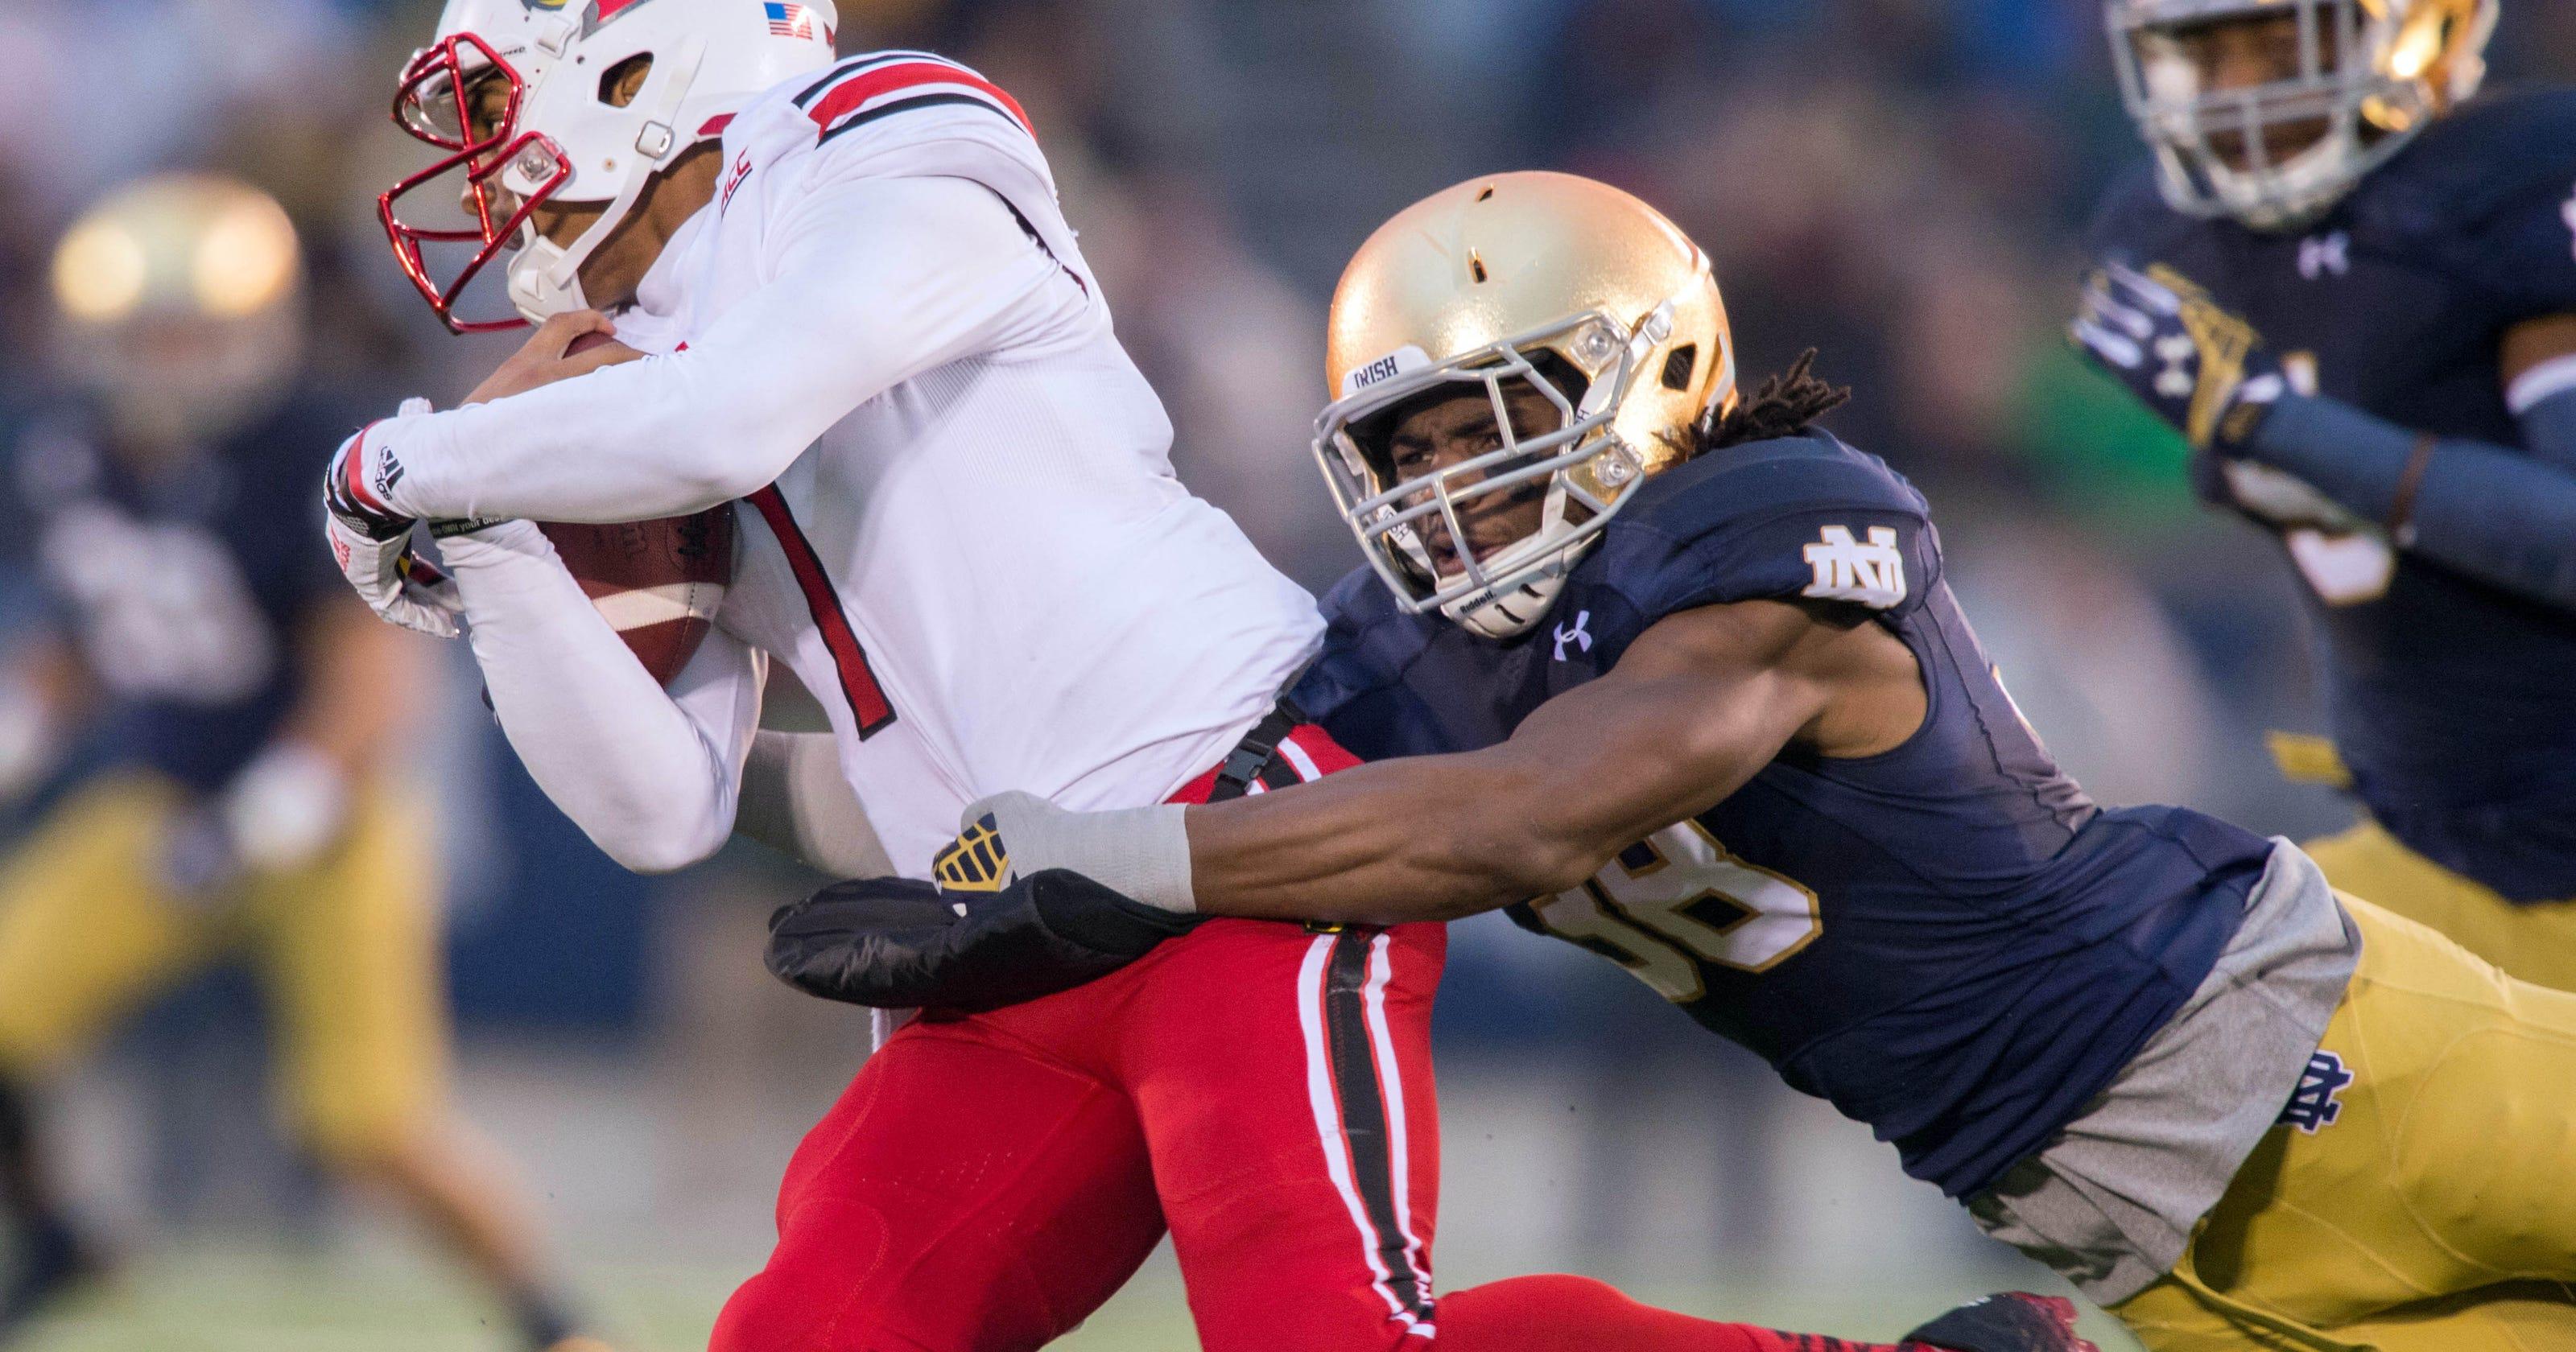 733d81a96 Notre Dame football falls to Louisville  Game Rewind